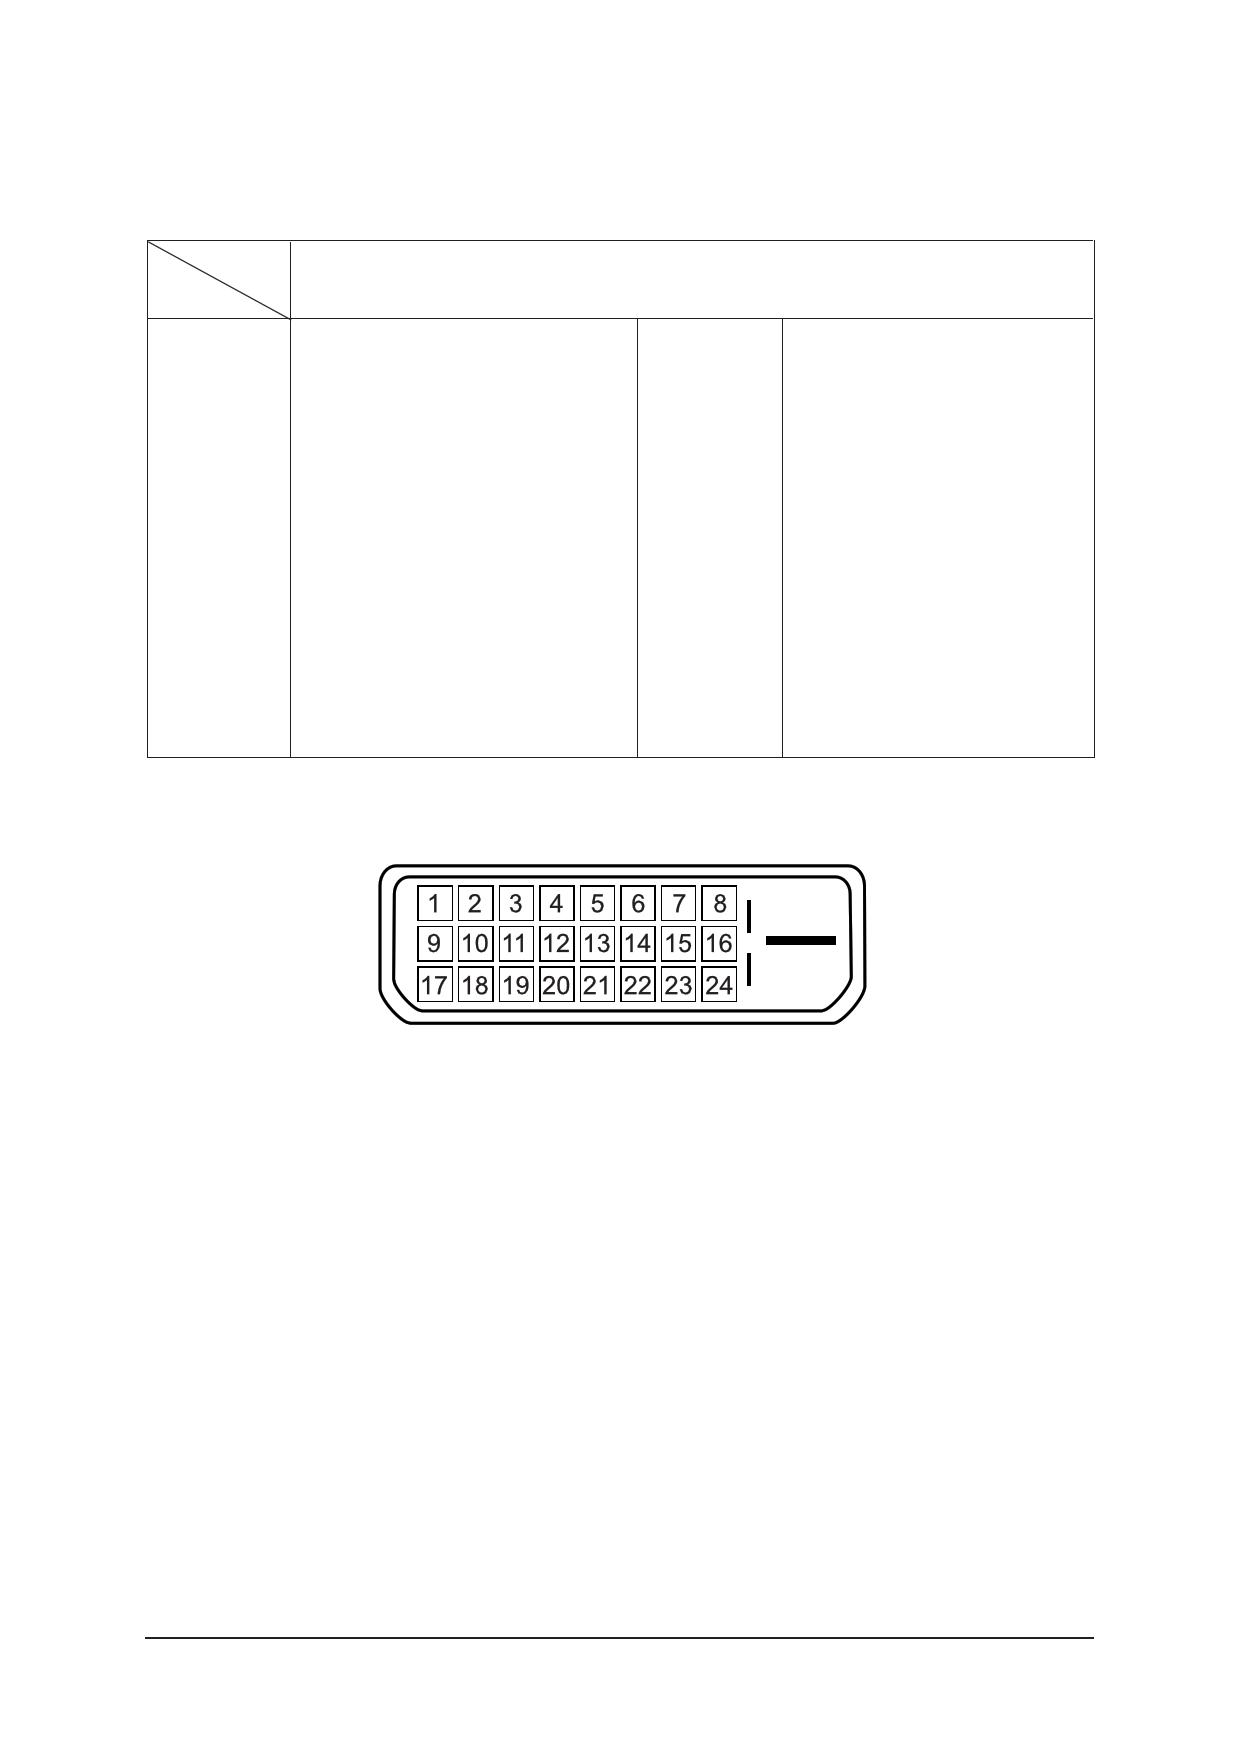 Samsung Lcd Tv Manual Pdf